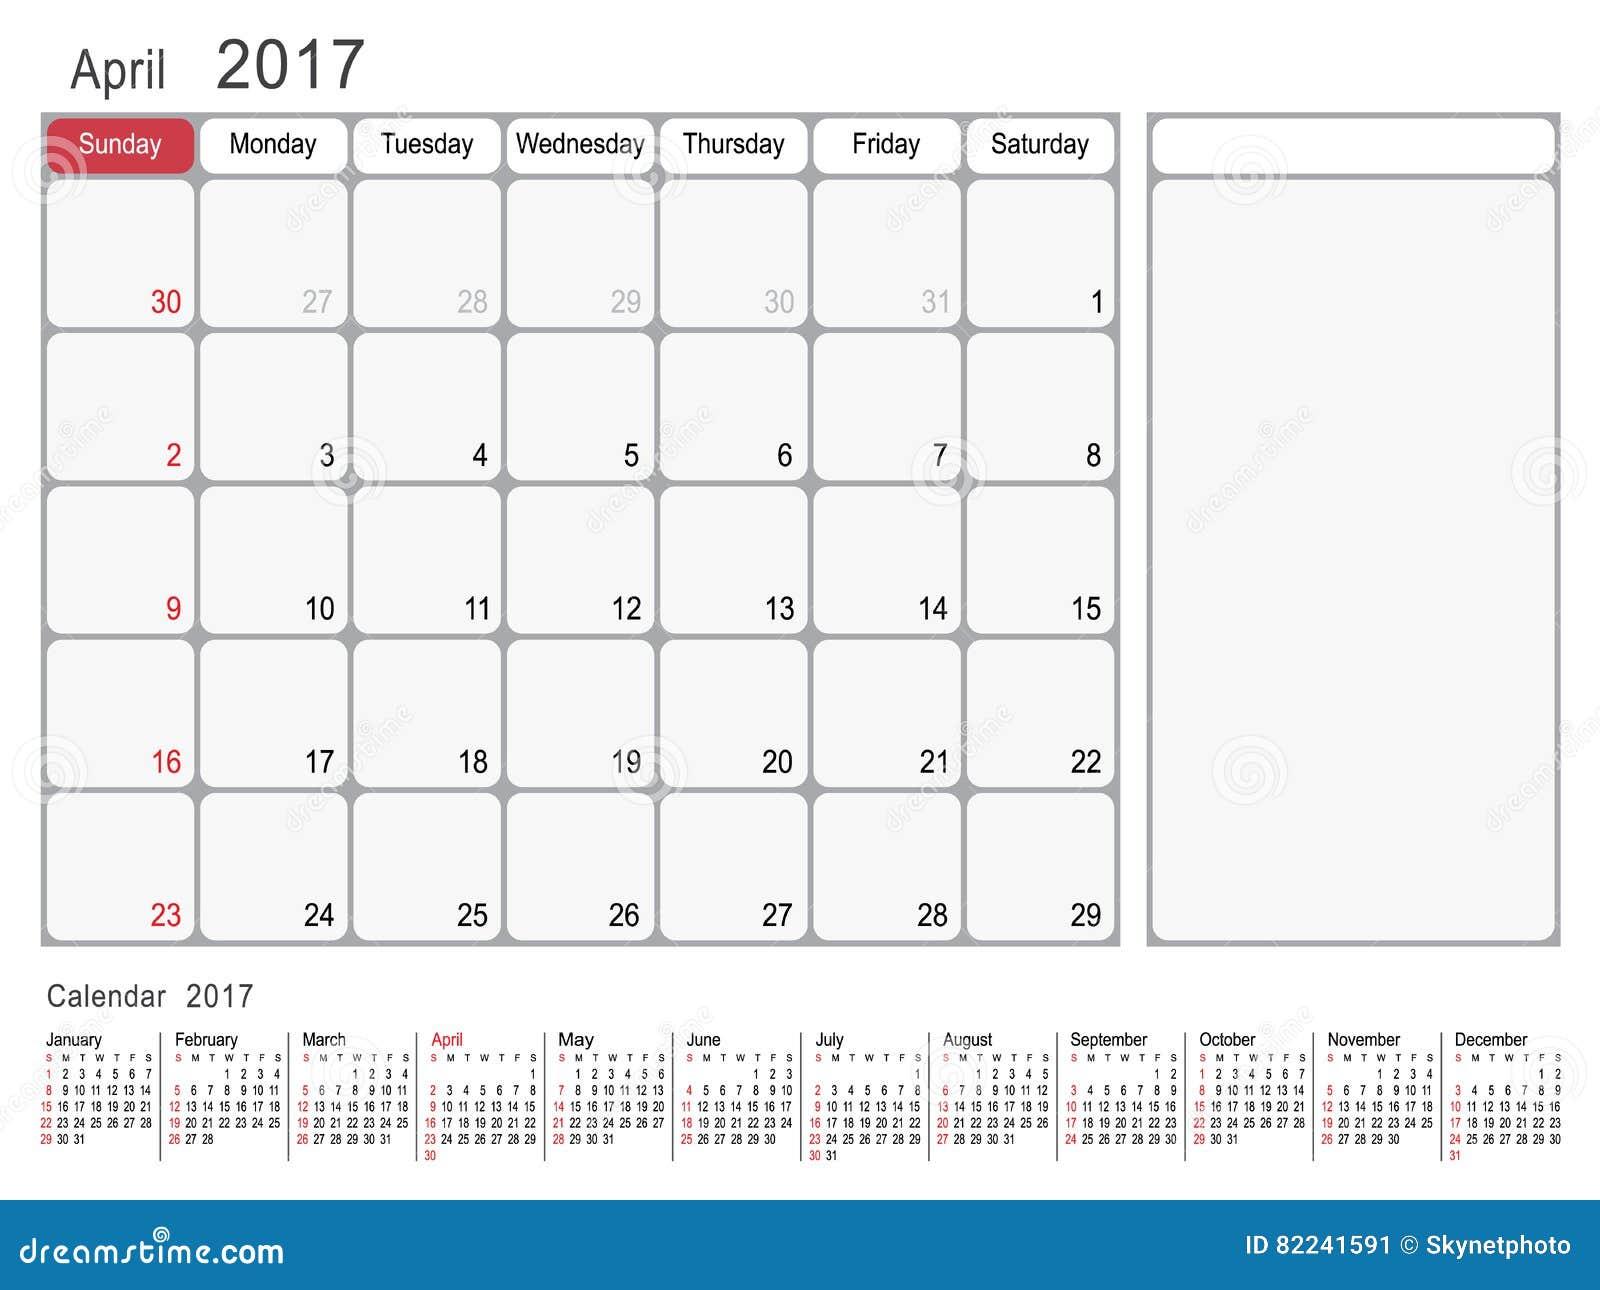 Сад и огород 2017 календарь работ